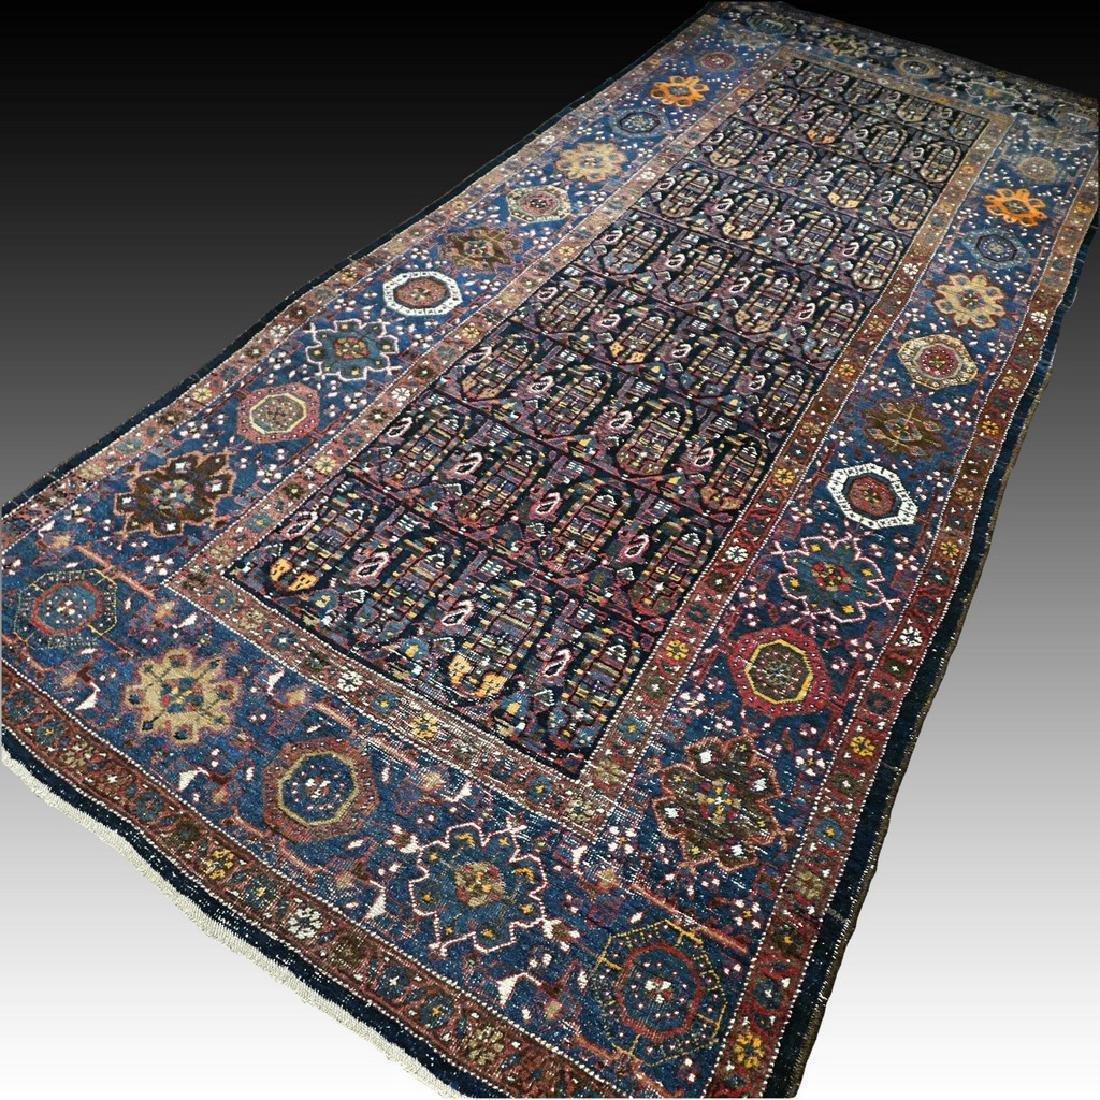 10.1x4.3 Antique Armenian boteh Kazak rug - 1880s -